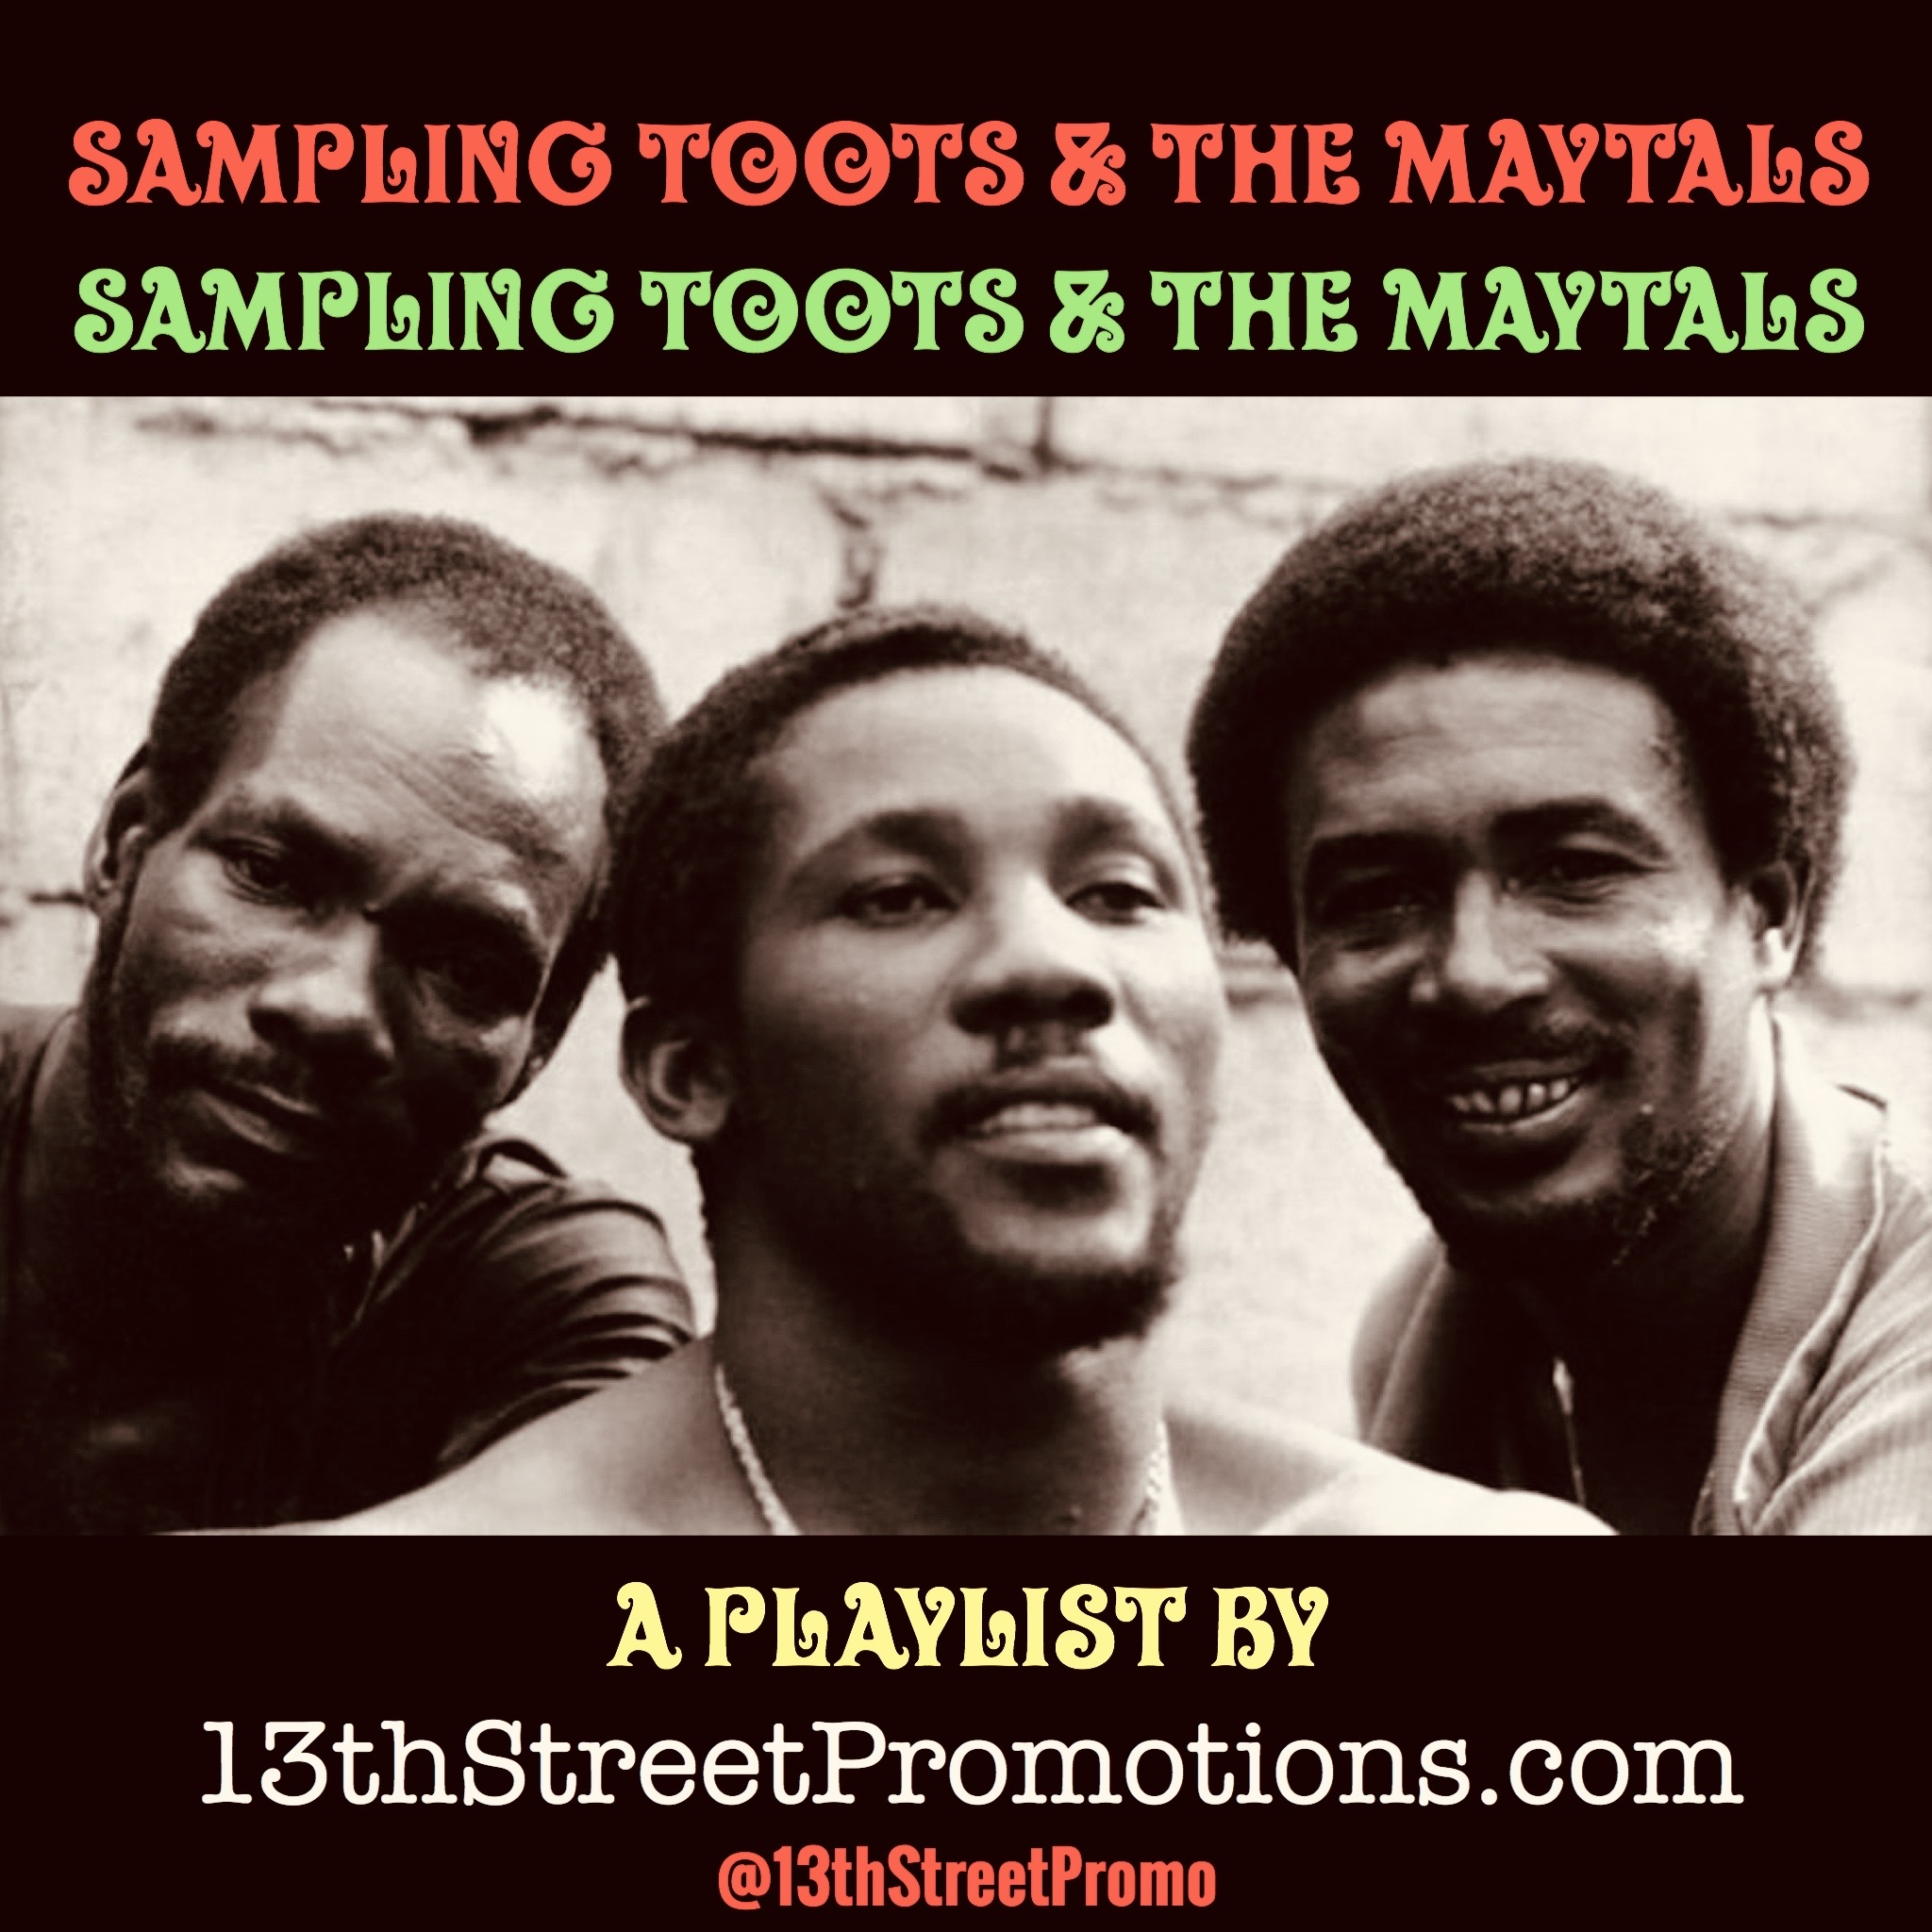 Jamaica Reggae Ska Rocksteady Hip Hop Pop Music EDM 13thStreetPromotions 13thStreetPromo Toots Hibbert Toots & the Maytals Caribbean Sample Sampling Toots & The Maytals Spotify Tidal Playlist